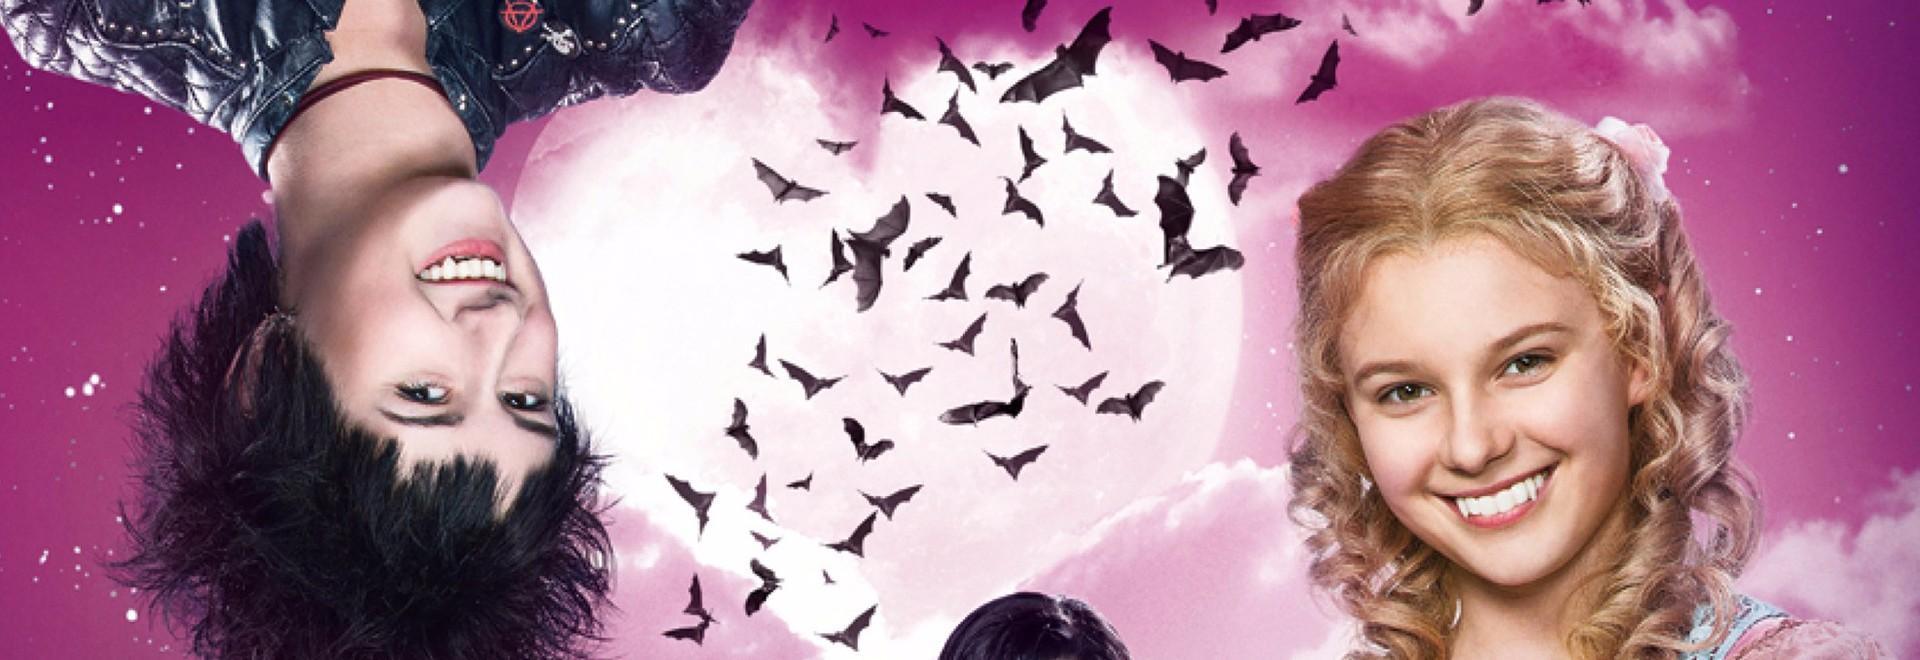 Sorelle Vampiro 2 - Pipistrelli nello stomaco